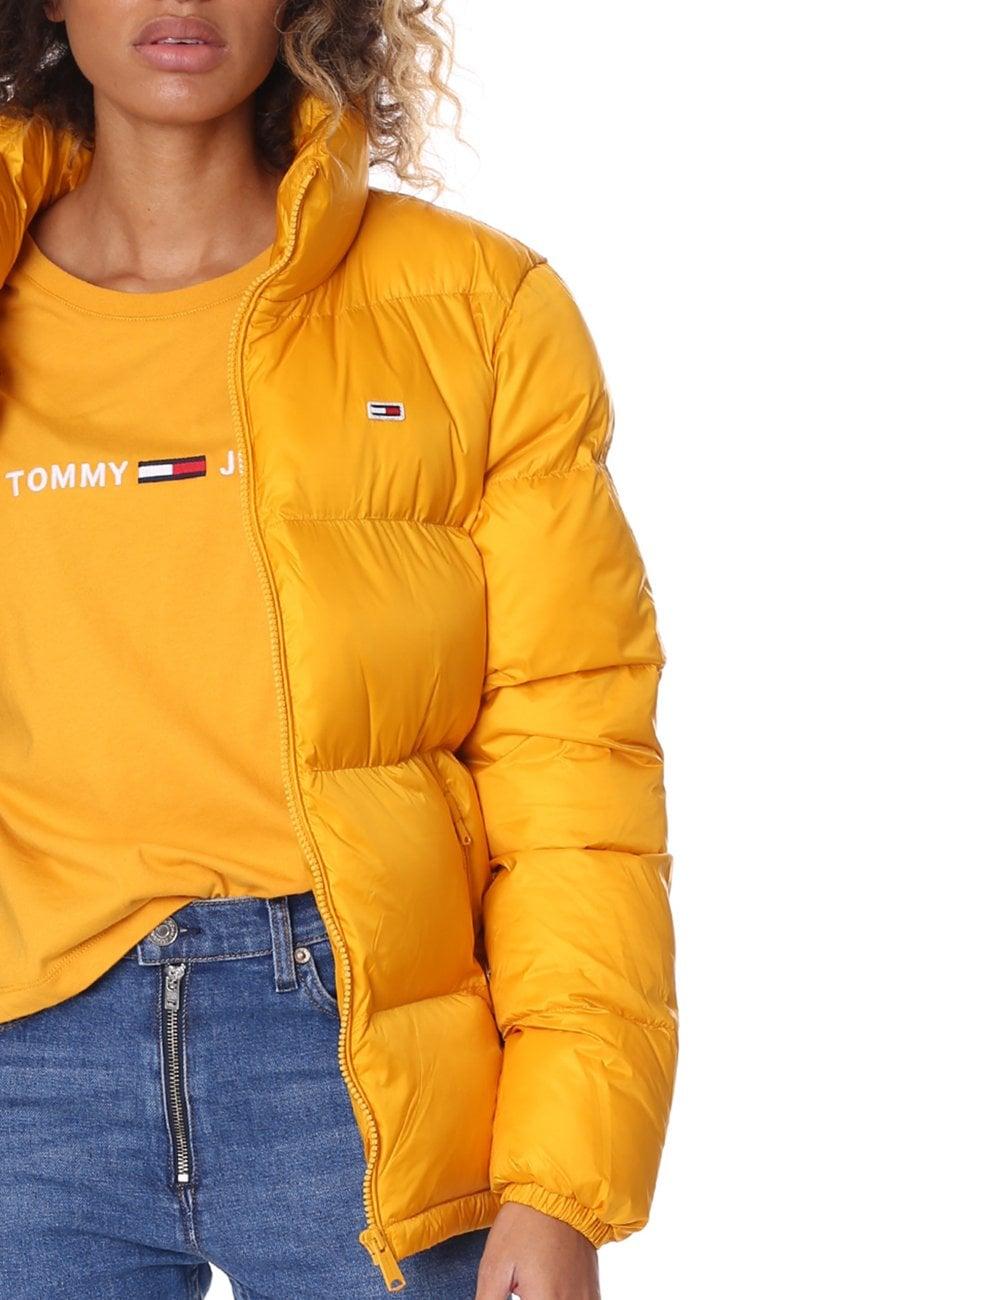 Tommy Hilfiger Women s Tommy Classic Puffa Jacket 1cf4a32597